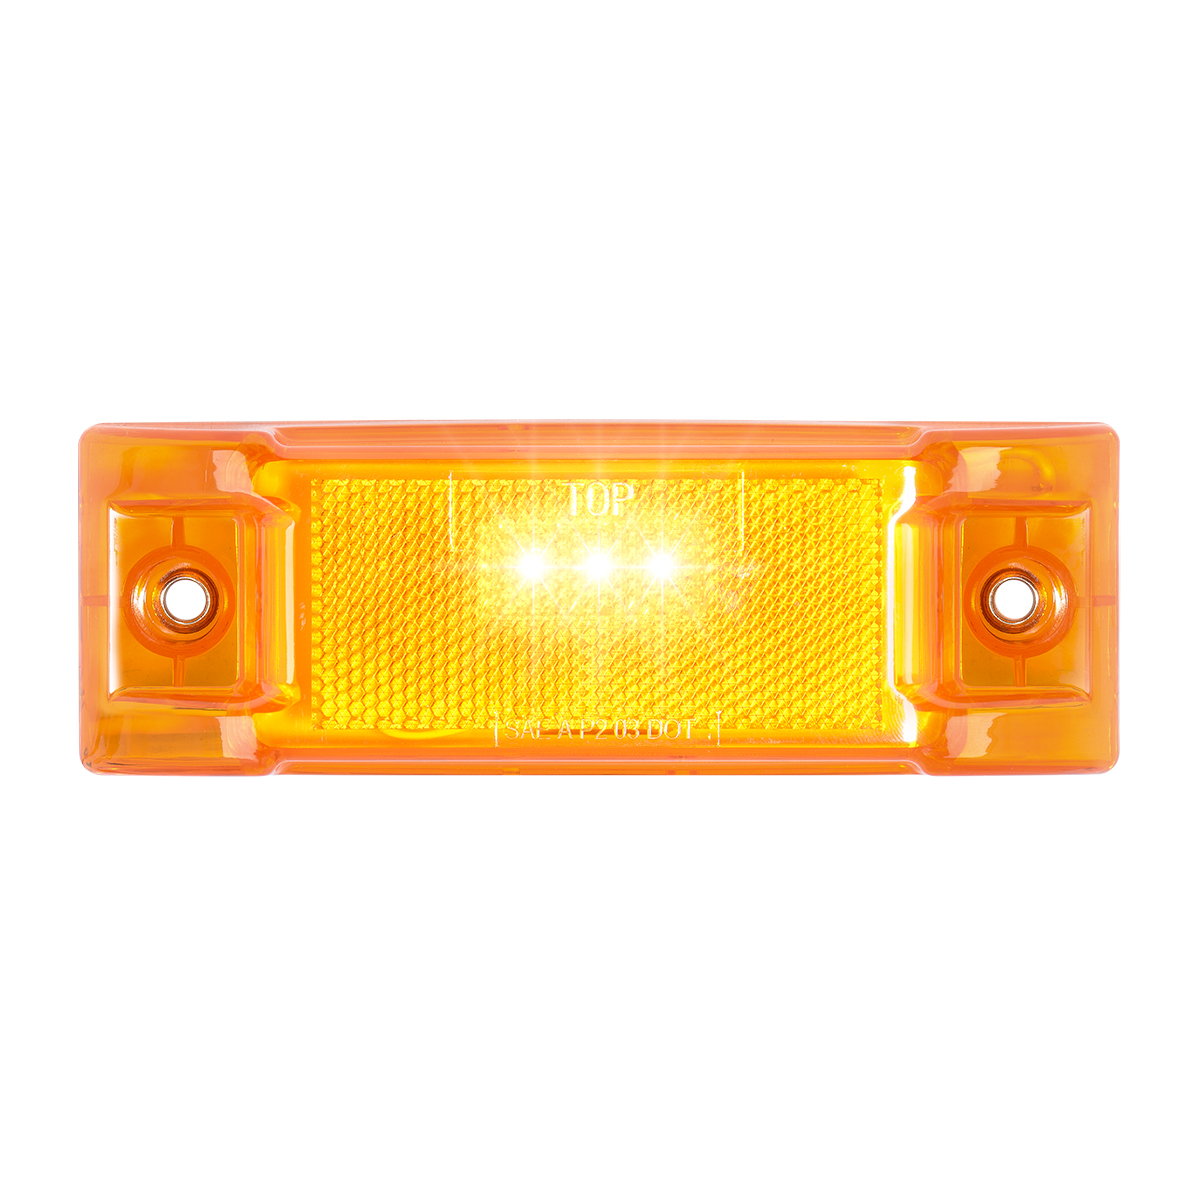 78330 Rectangular LED Marker Light with Reflector Lens in Amber/Amber